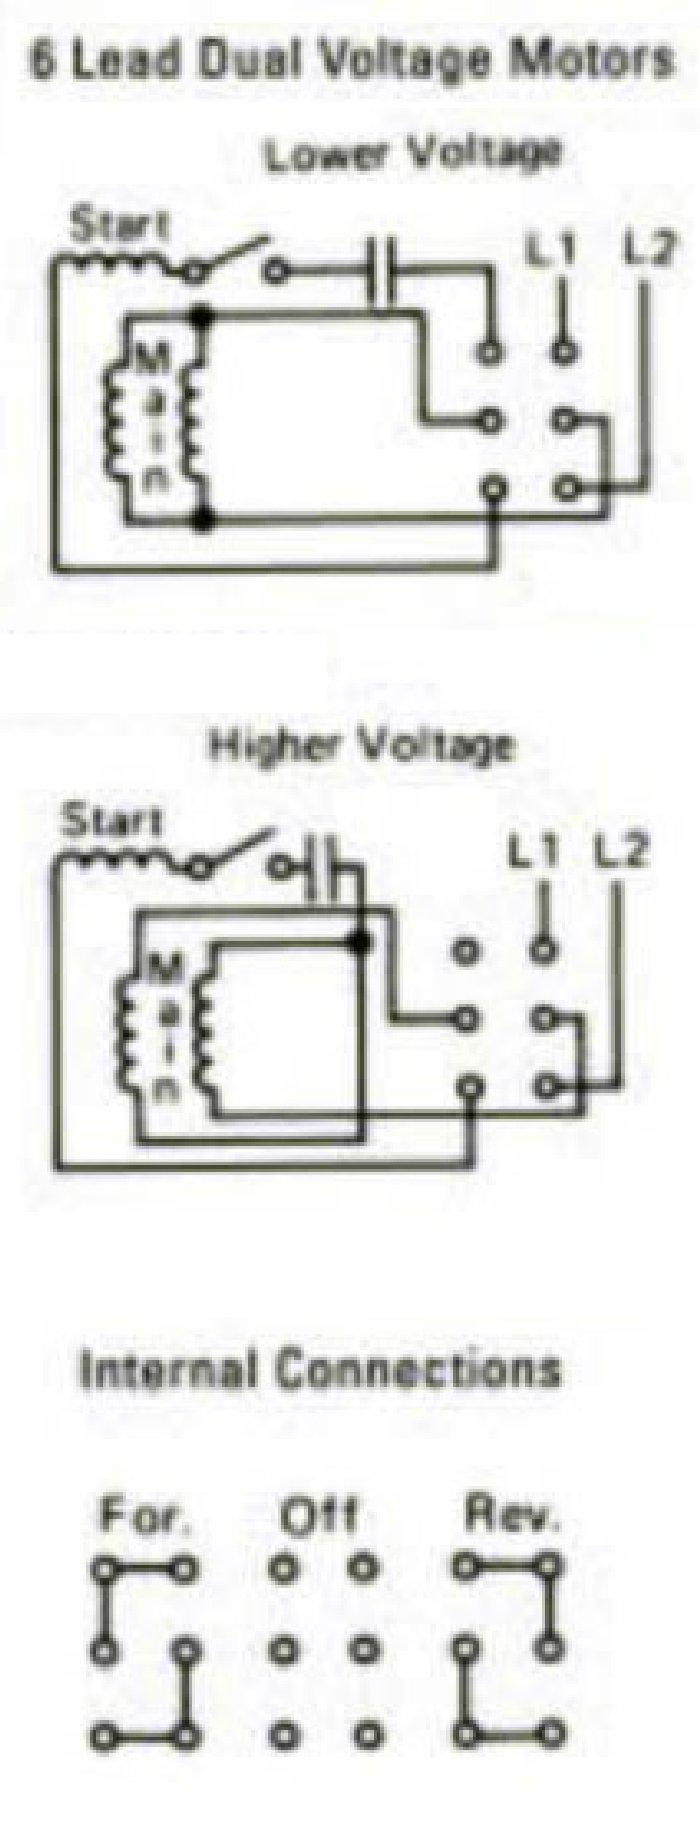 wye delta transformer wiring diagram ls3 ecm index of /electrical